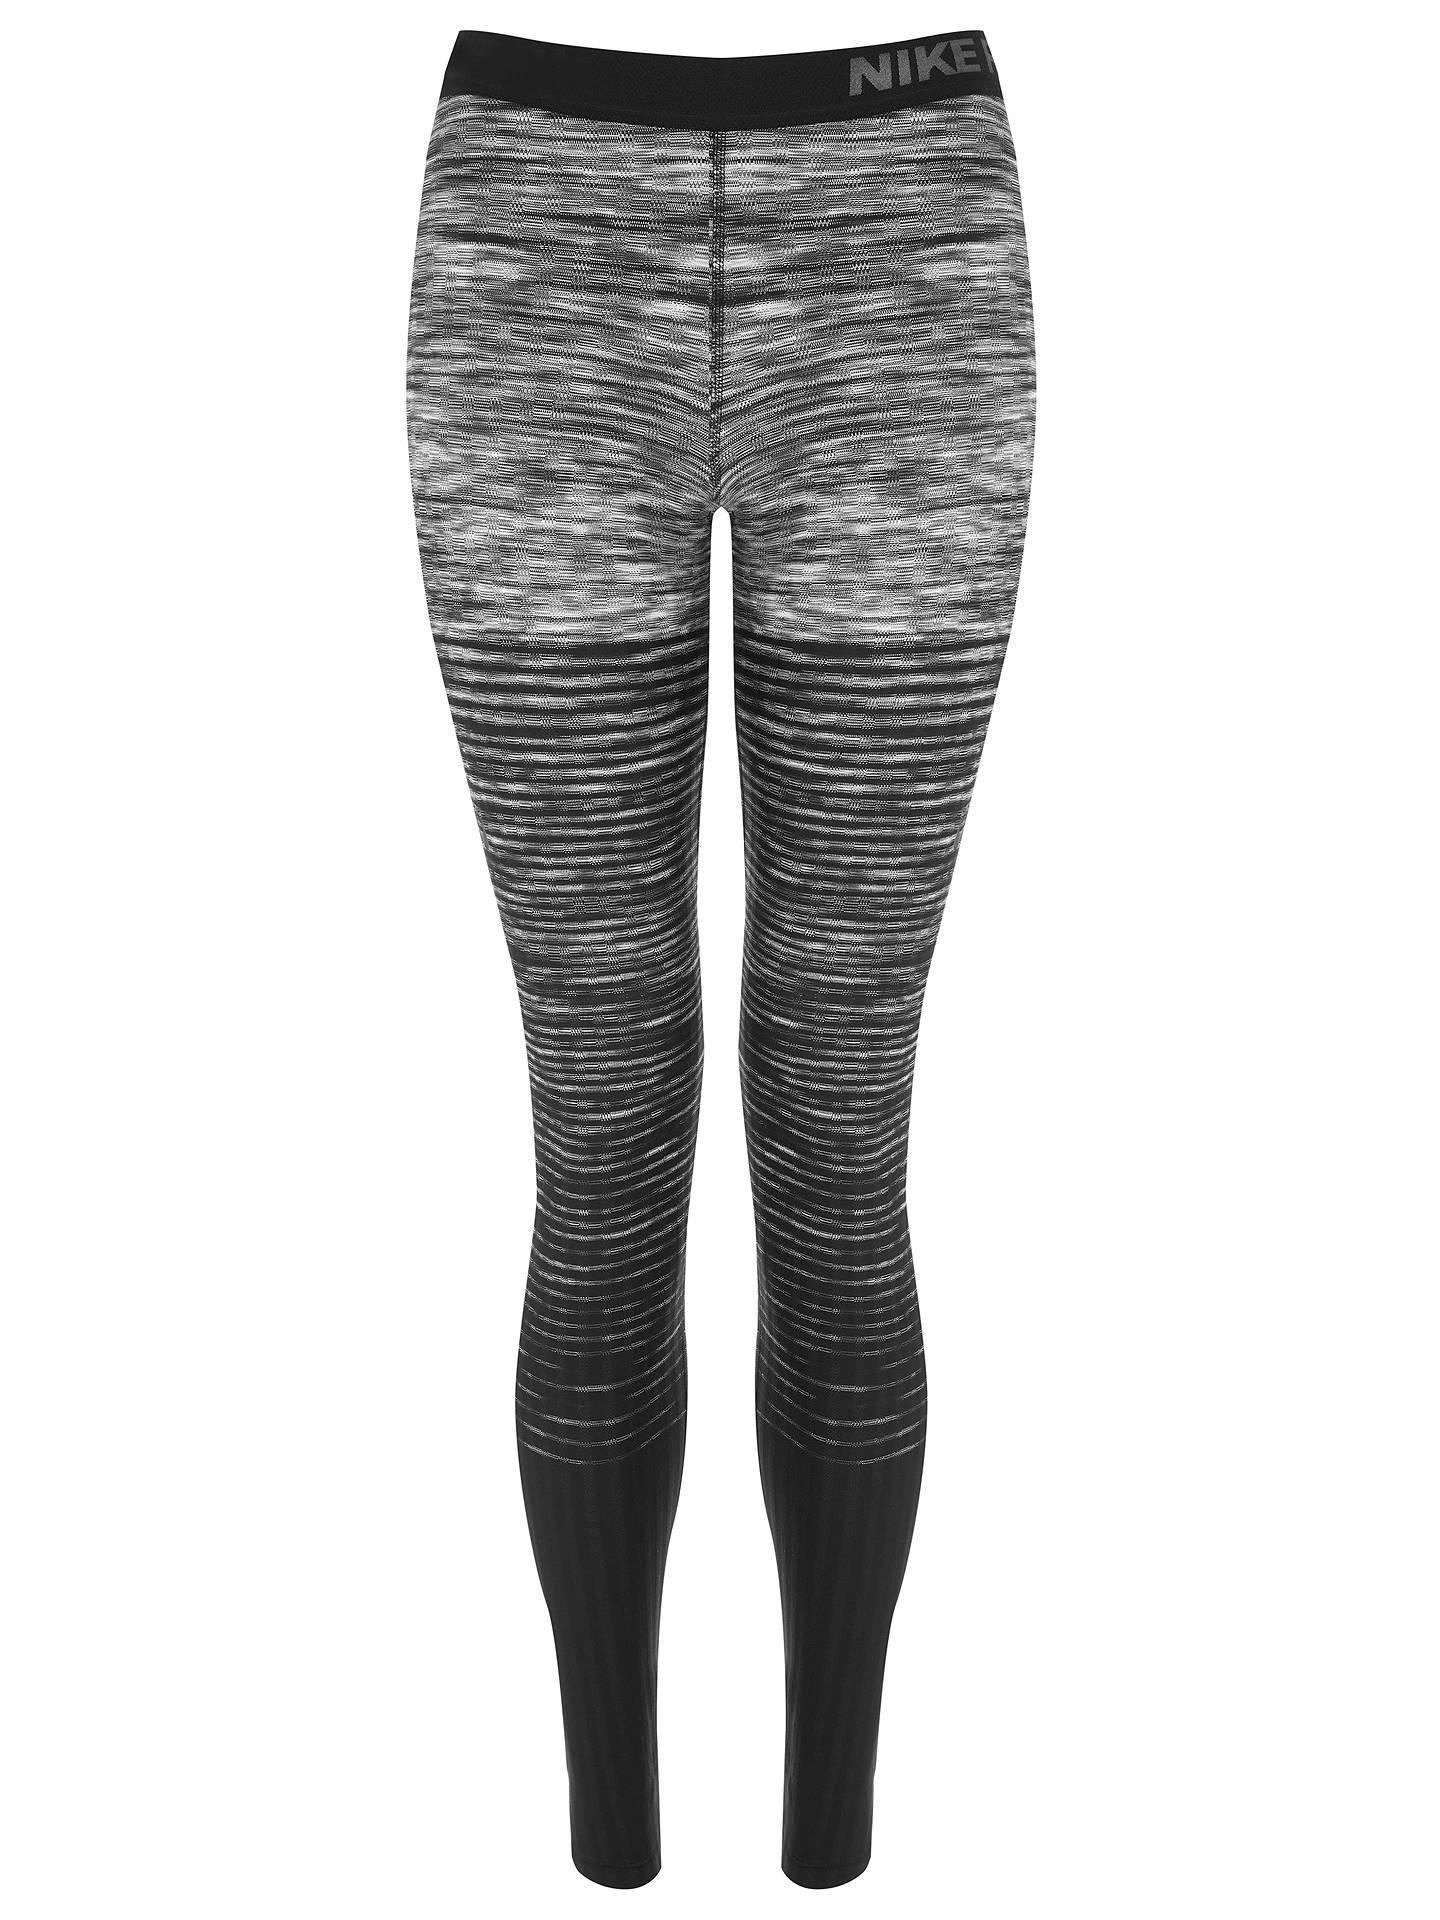 643b5b24e9444 ... Buy Nike Pro Hyperwarm Training Tights, Dark Grey/White, XS Online at  johnlewis ...